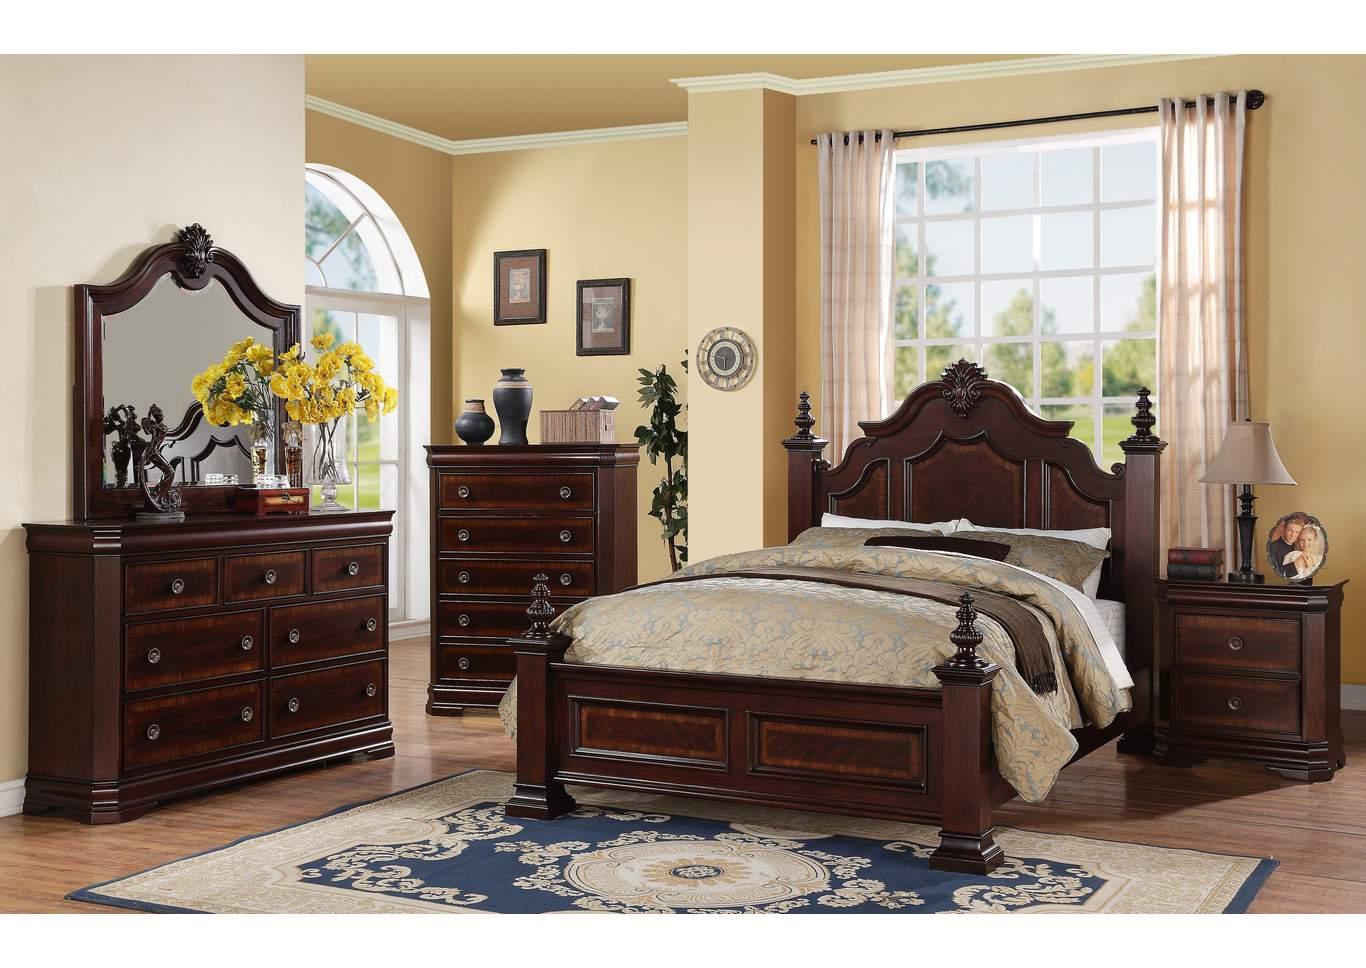 Furniture Liquidators Baton Rouge LA Charlotte Queen